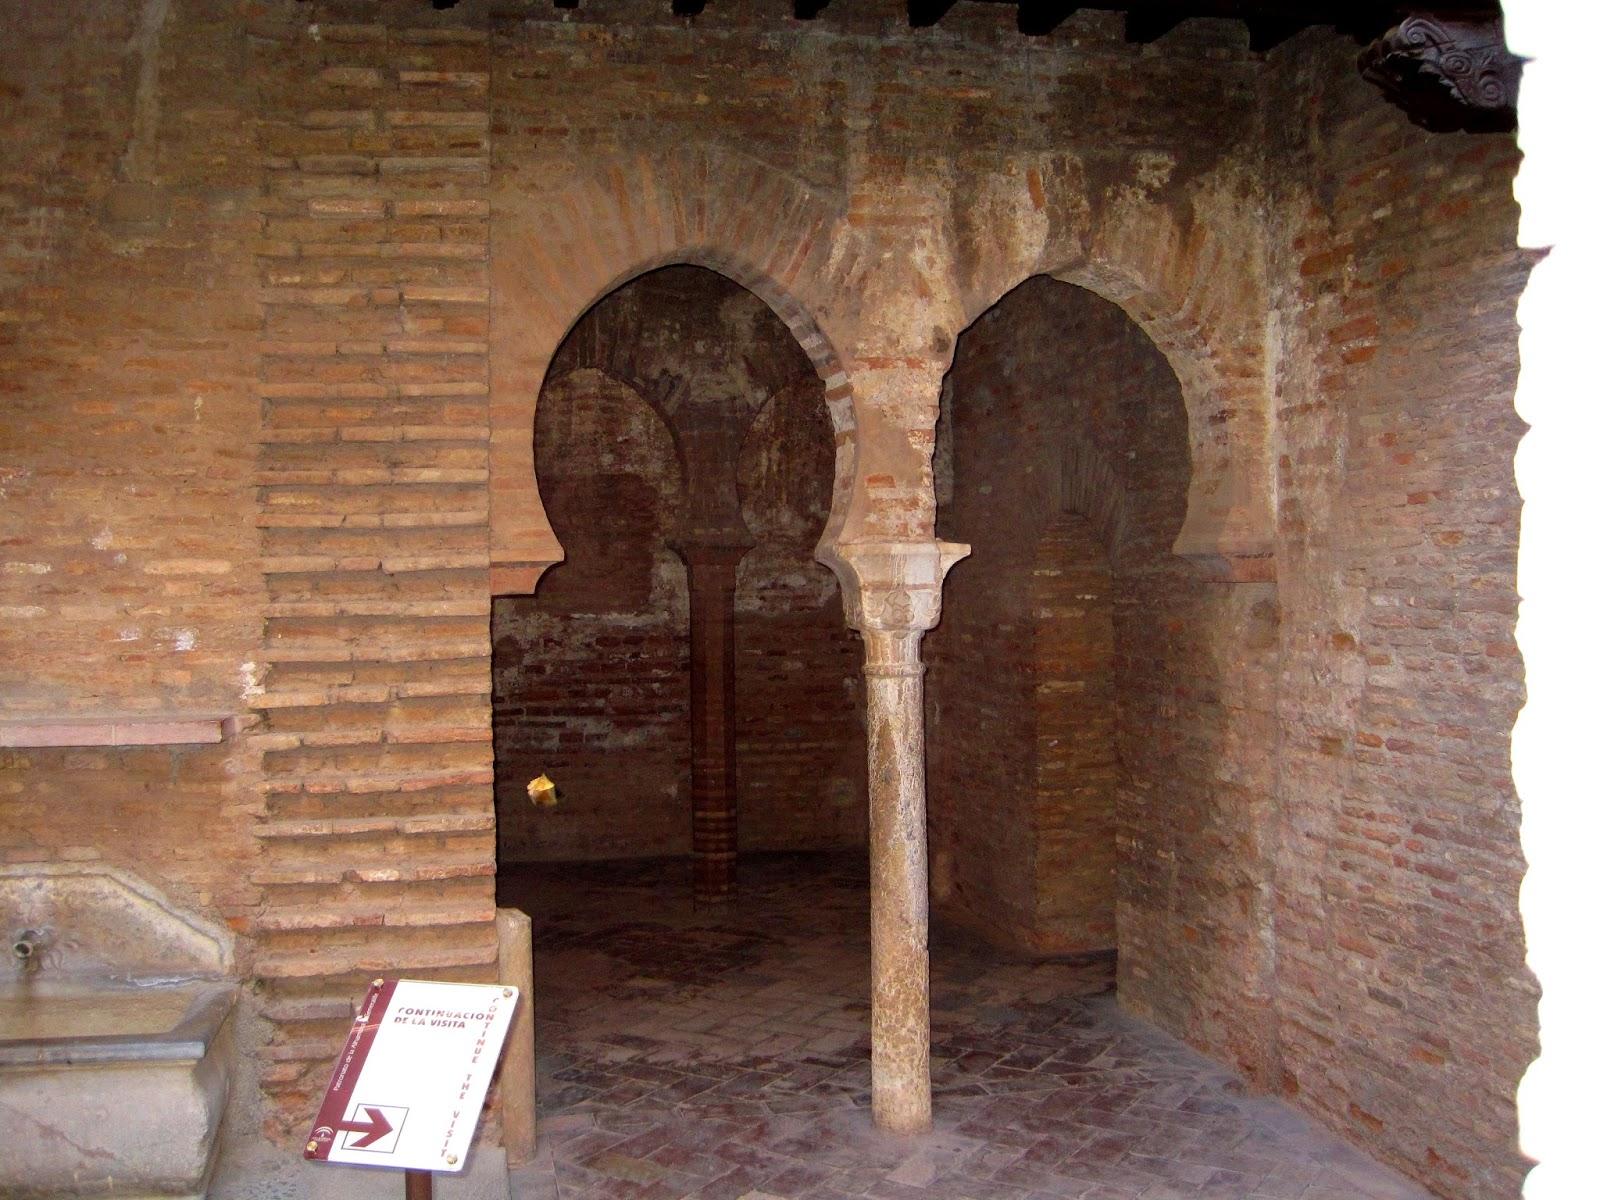 Arabes Real De La Alhambra:baños de la mezquita mayor de la alhambra ...